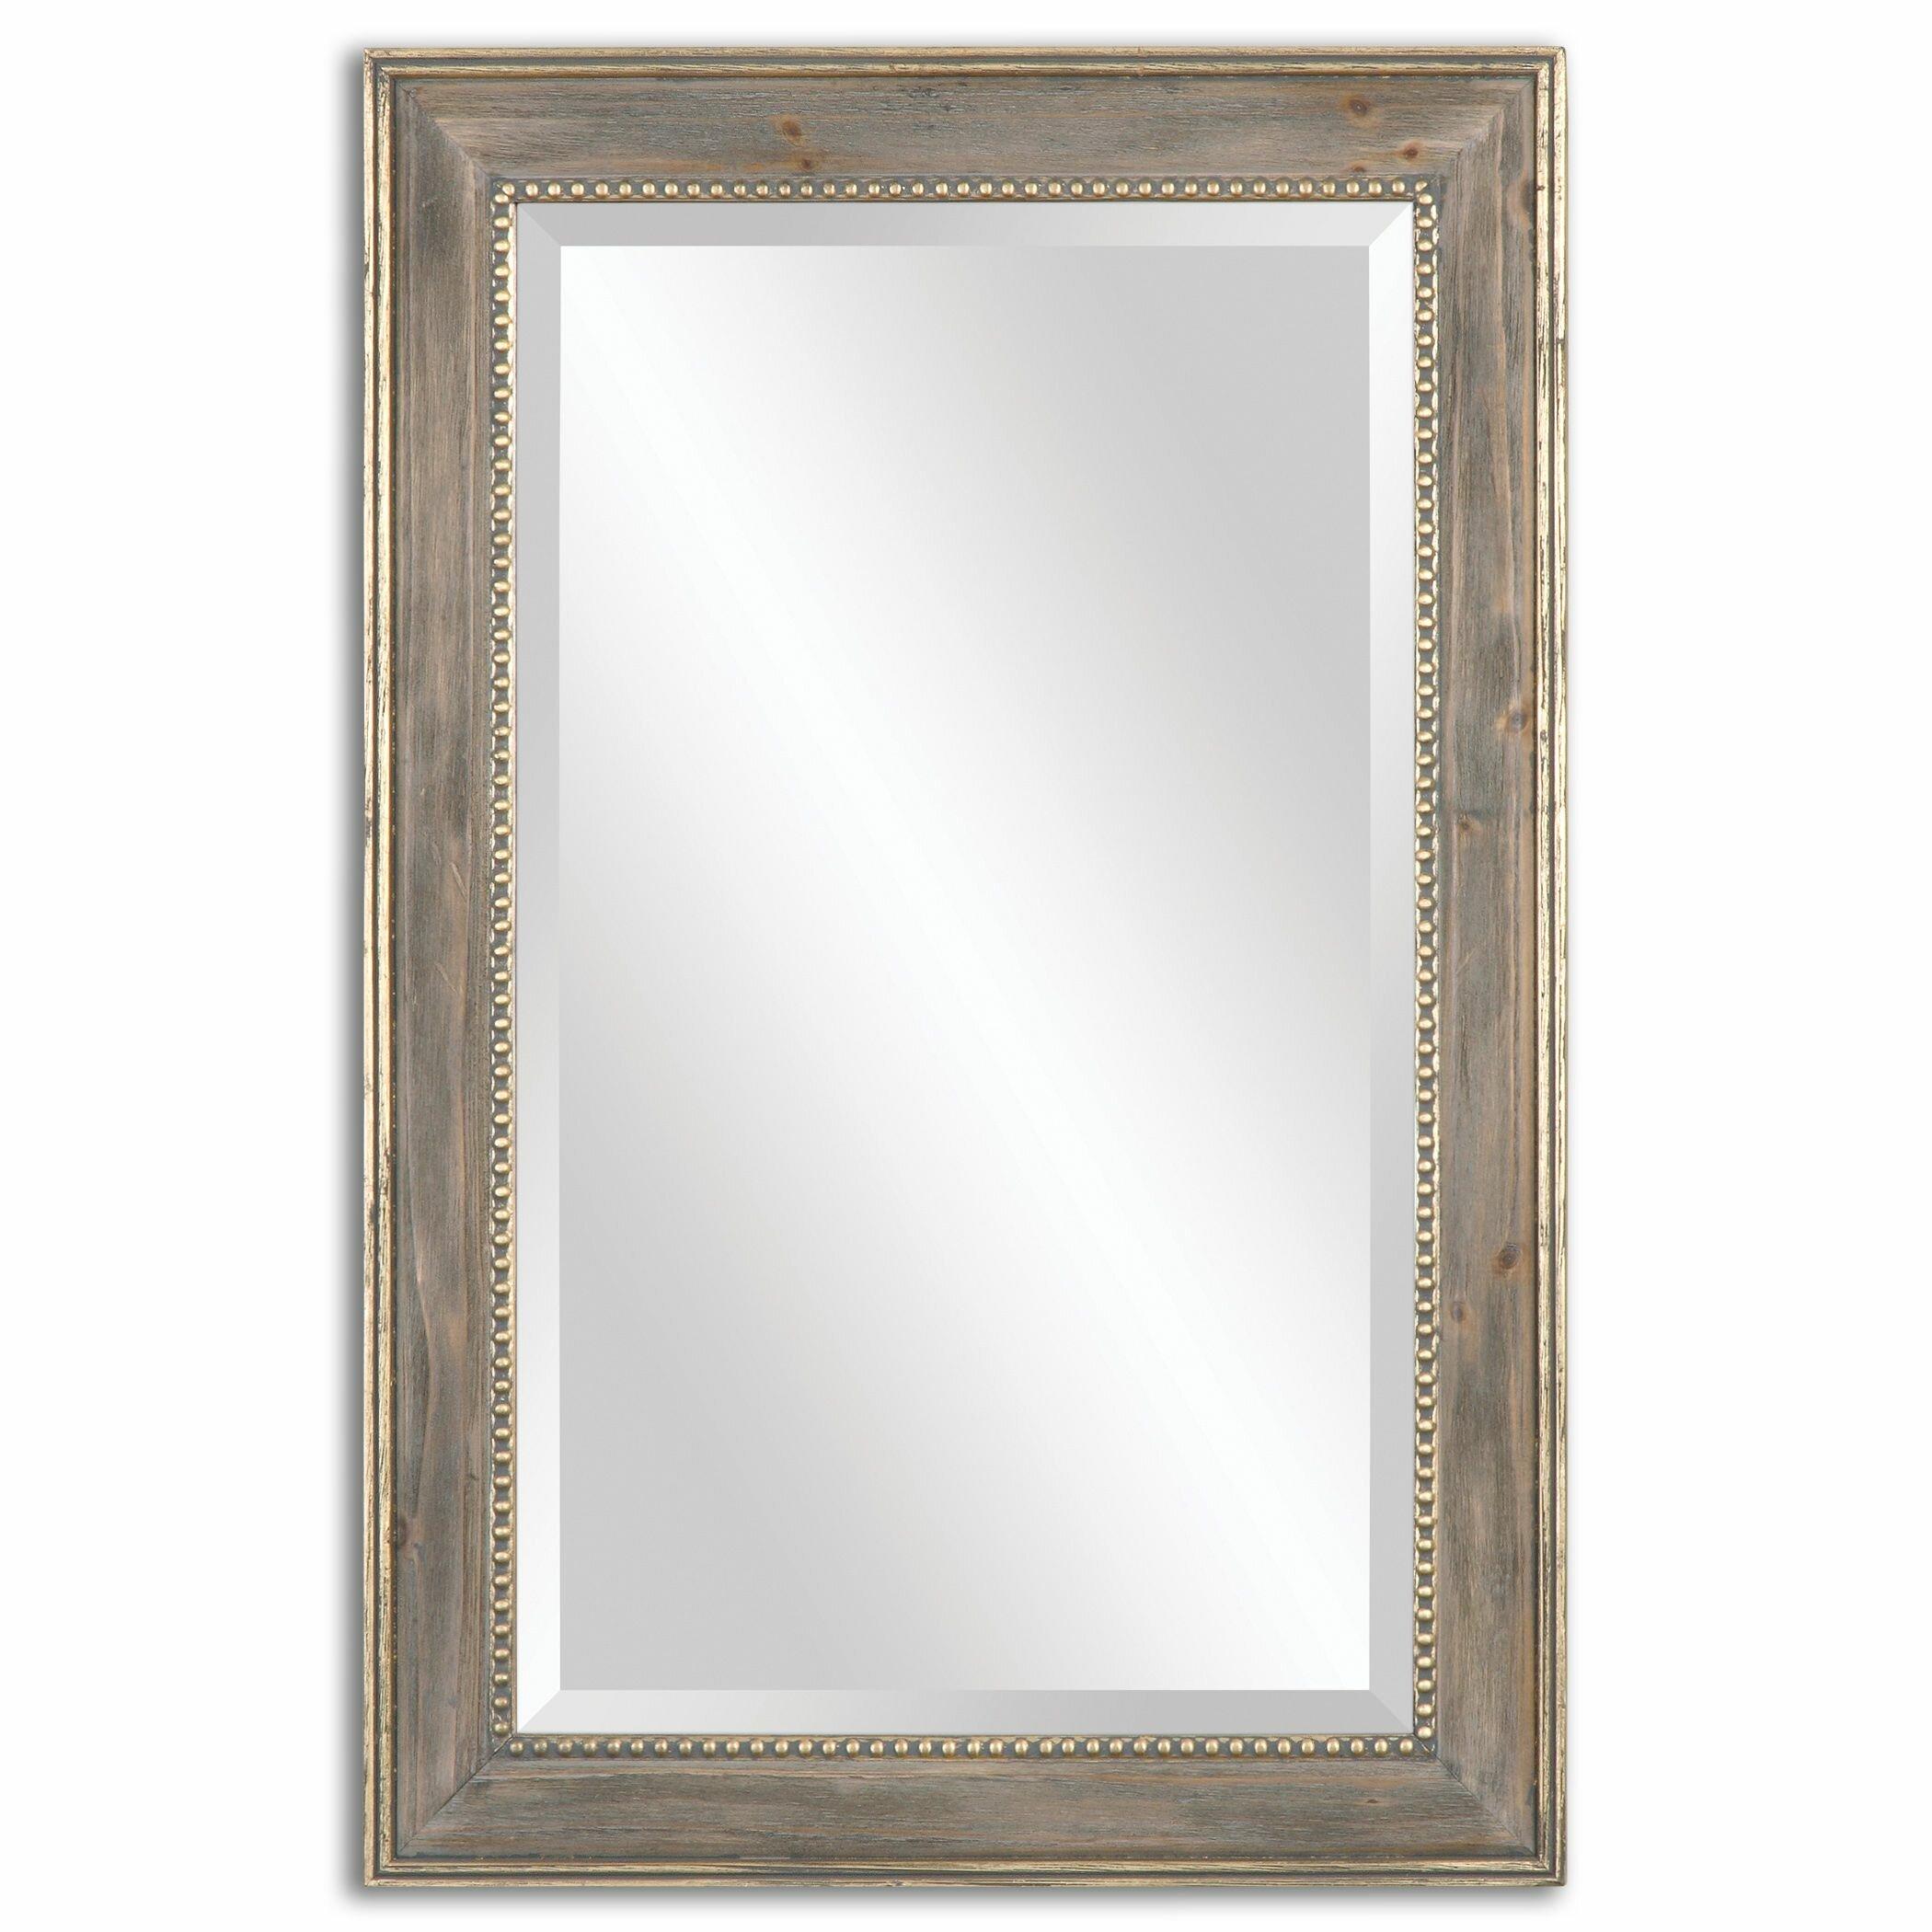 Darby home co rectangle mirror reviews wayfair for Rectangle mirror